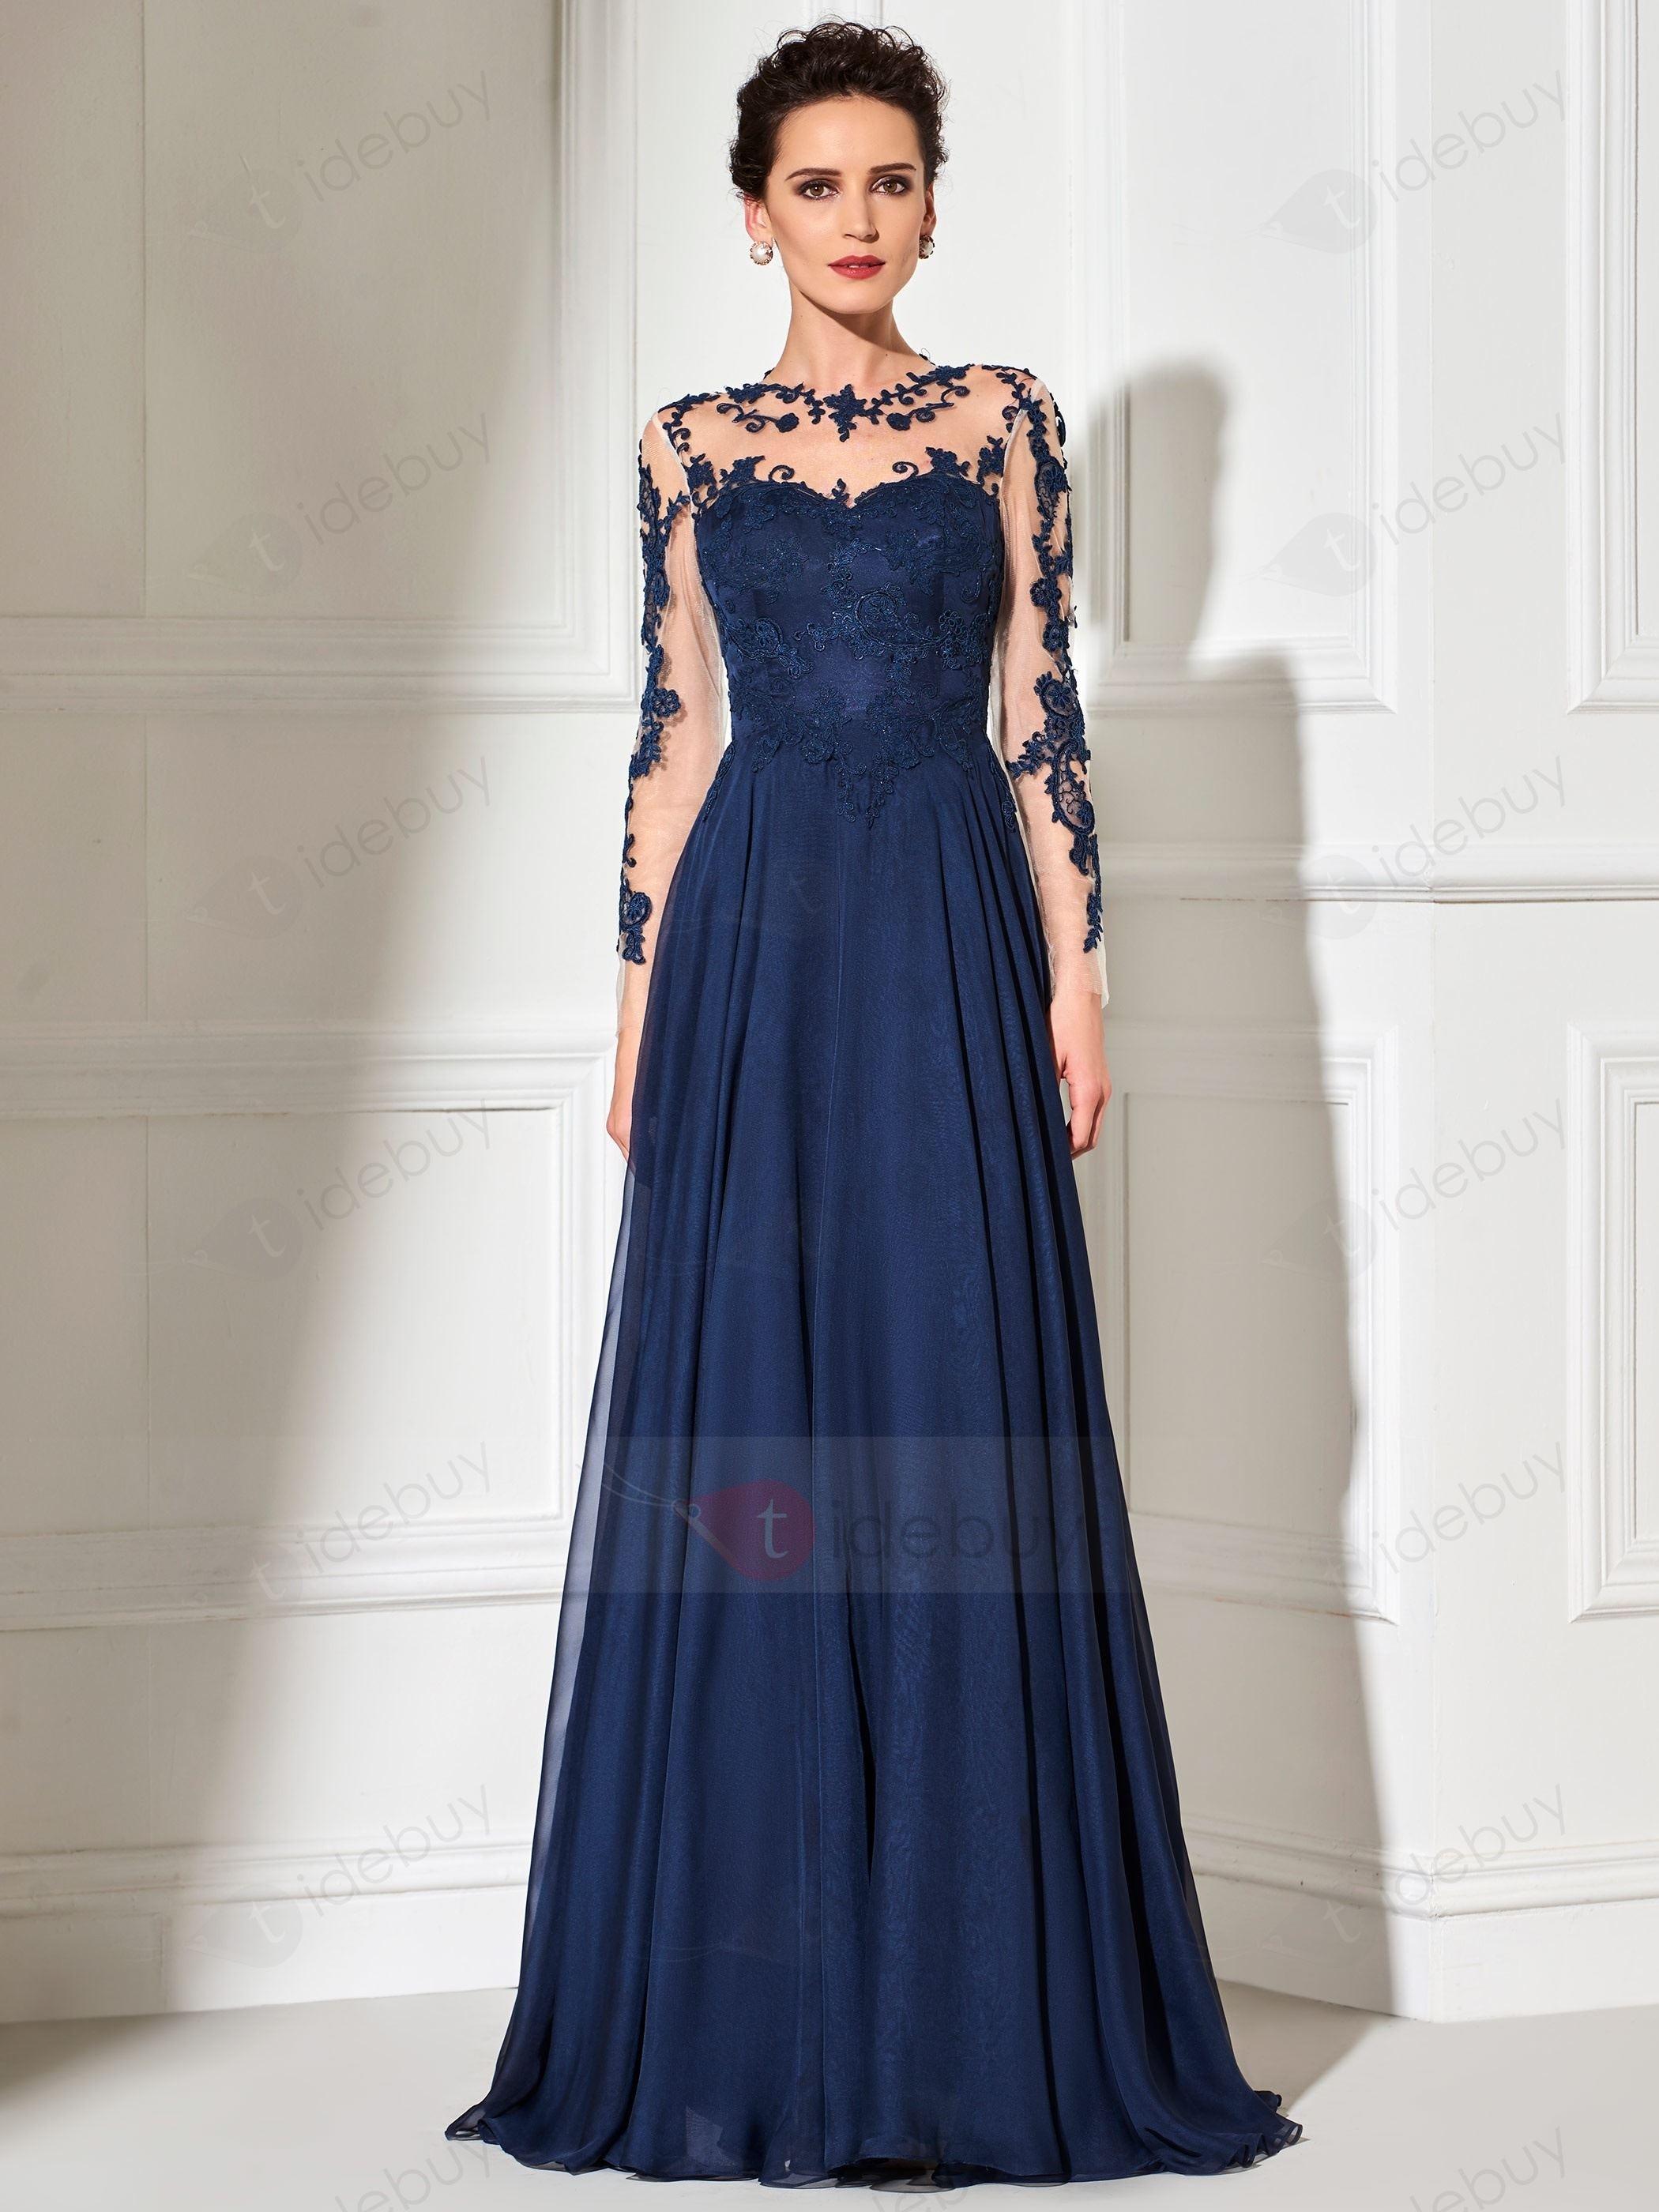 17 Kreativ Abendkleider Aus Spitze Lang ÄrmelFormal Genial Abendkleider Aus Spitze Lang Design